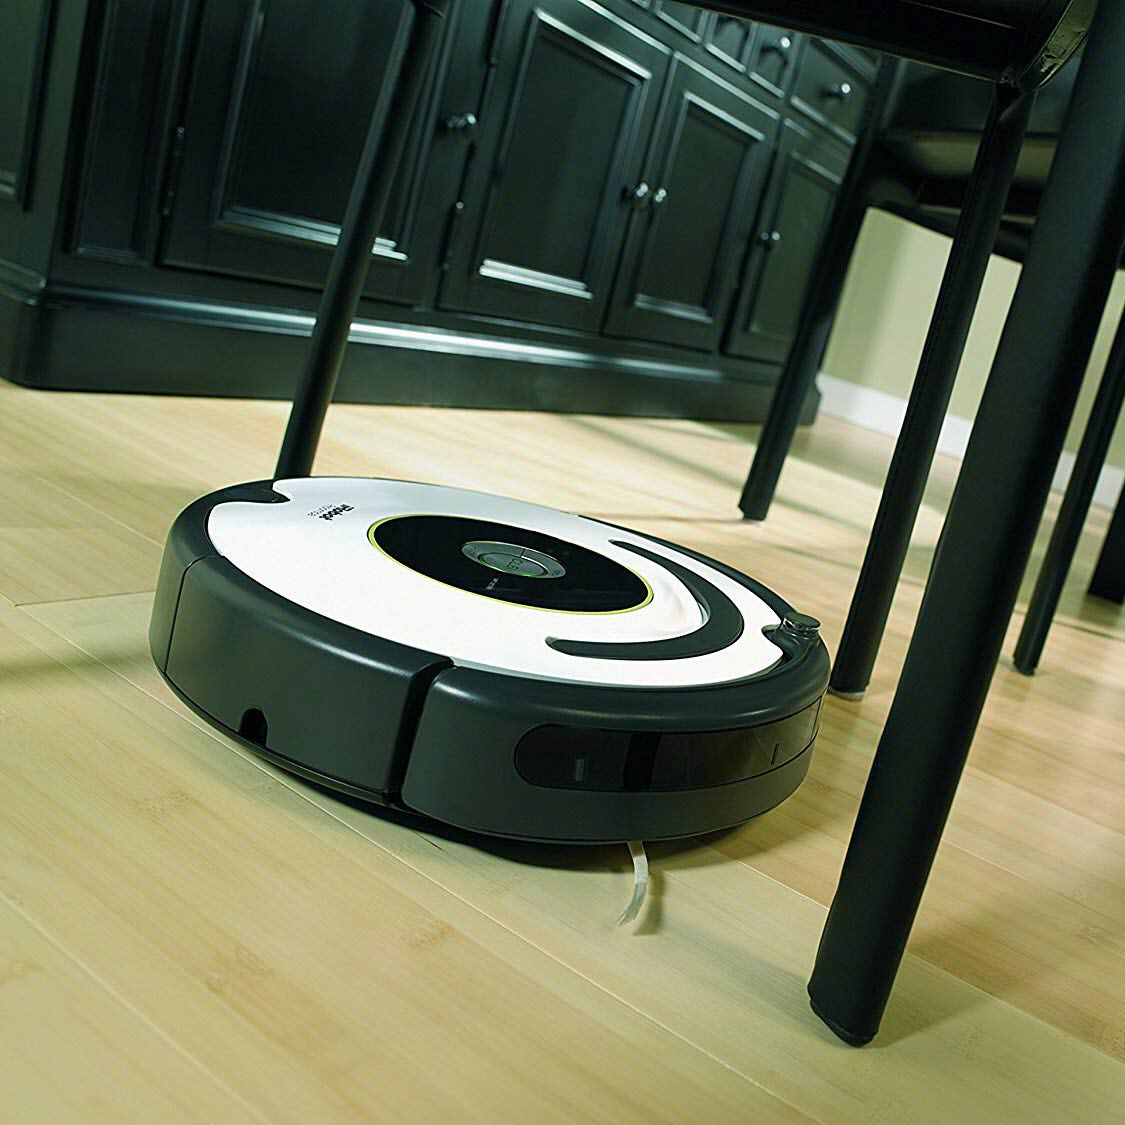 Robot hút bụi iRobot Roomba 620 Staubsaug